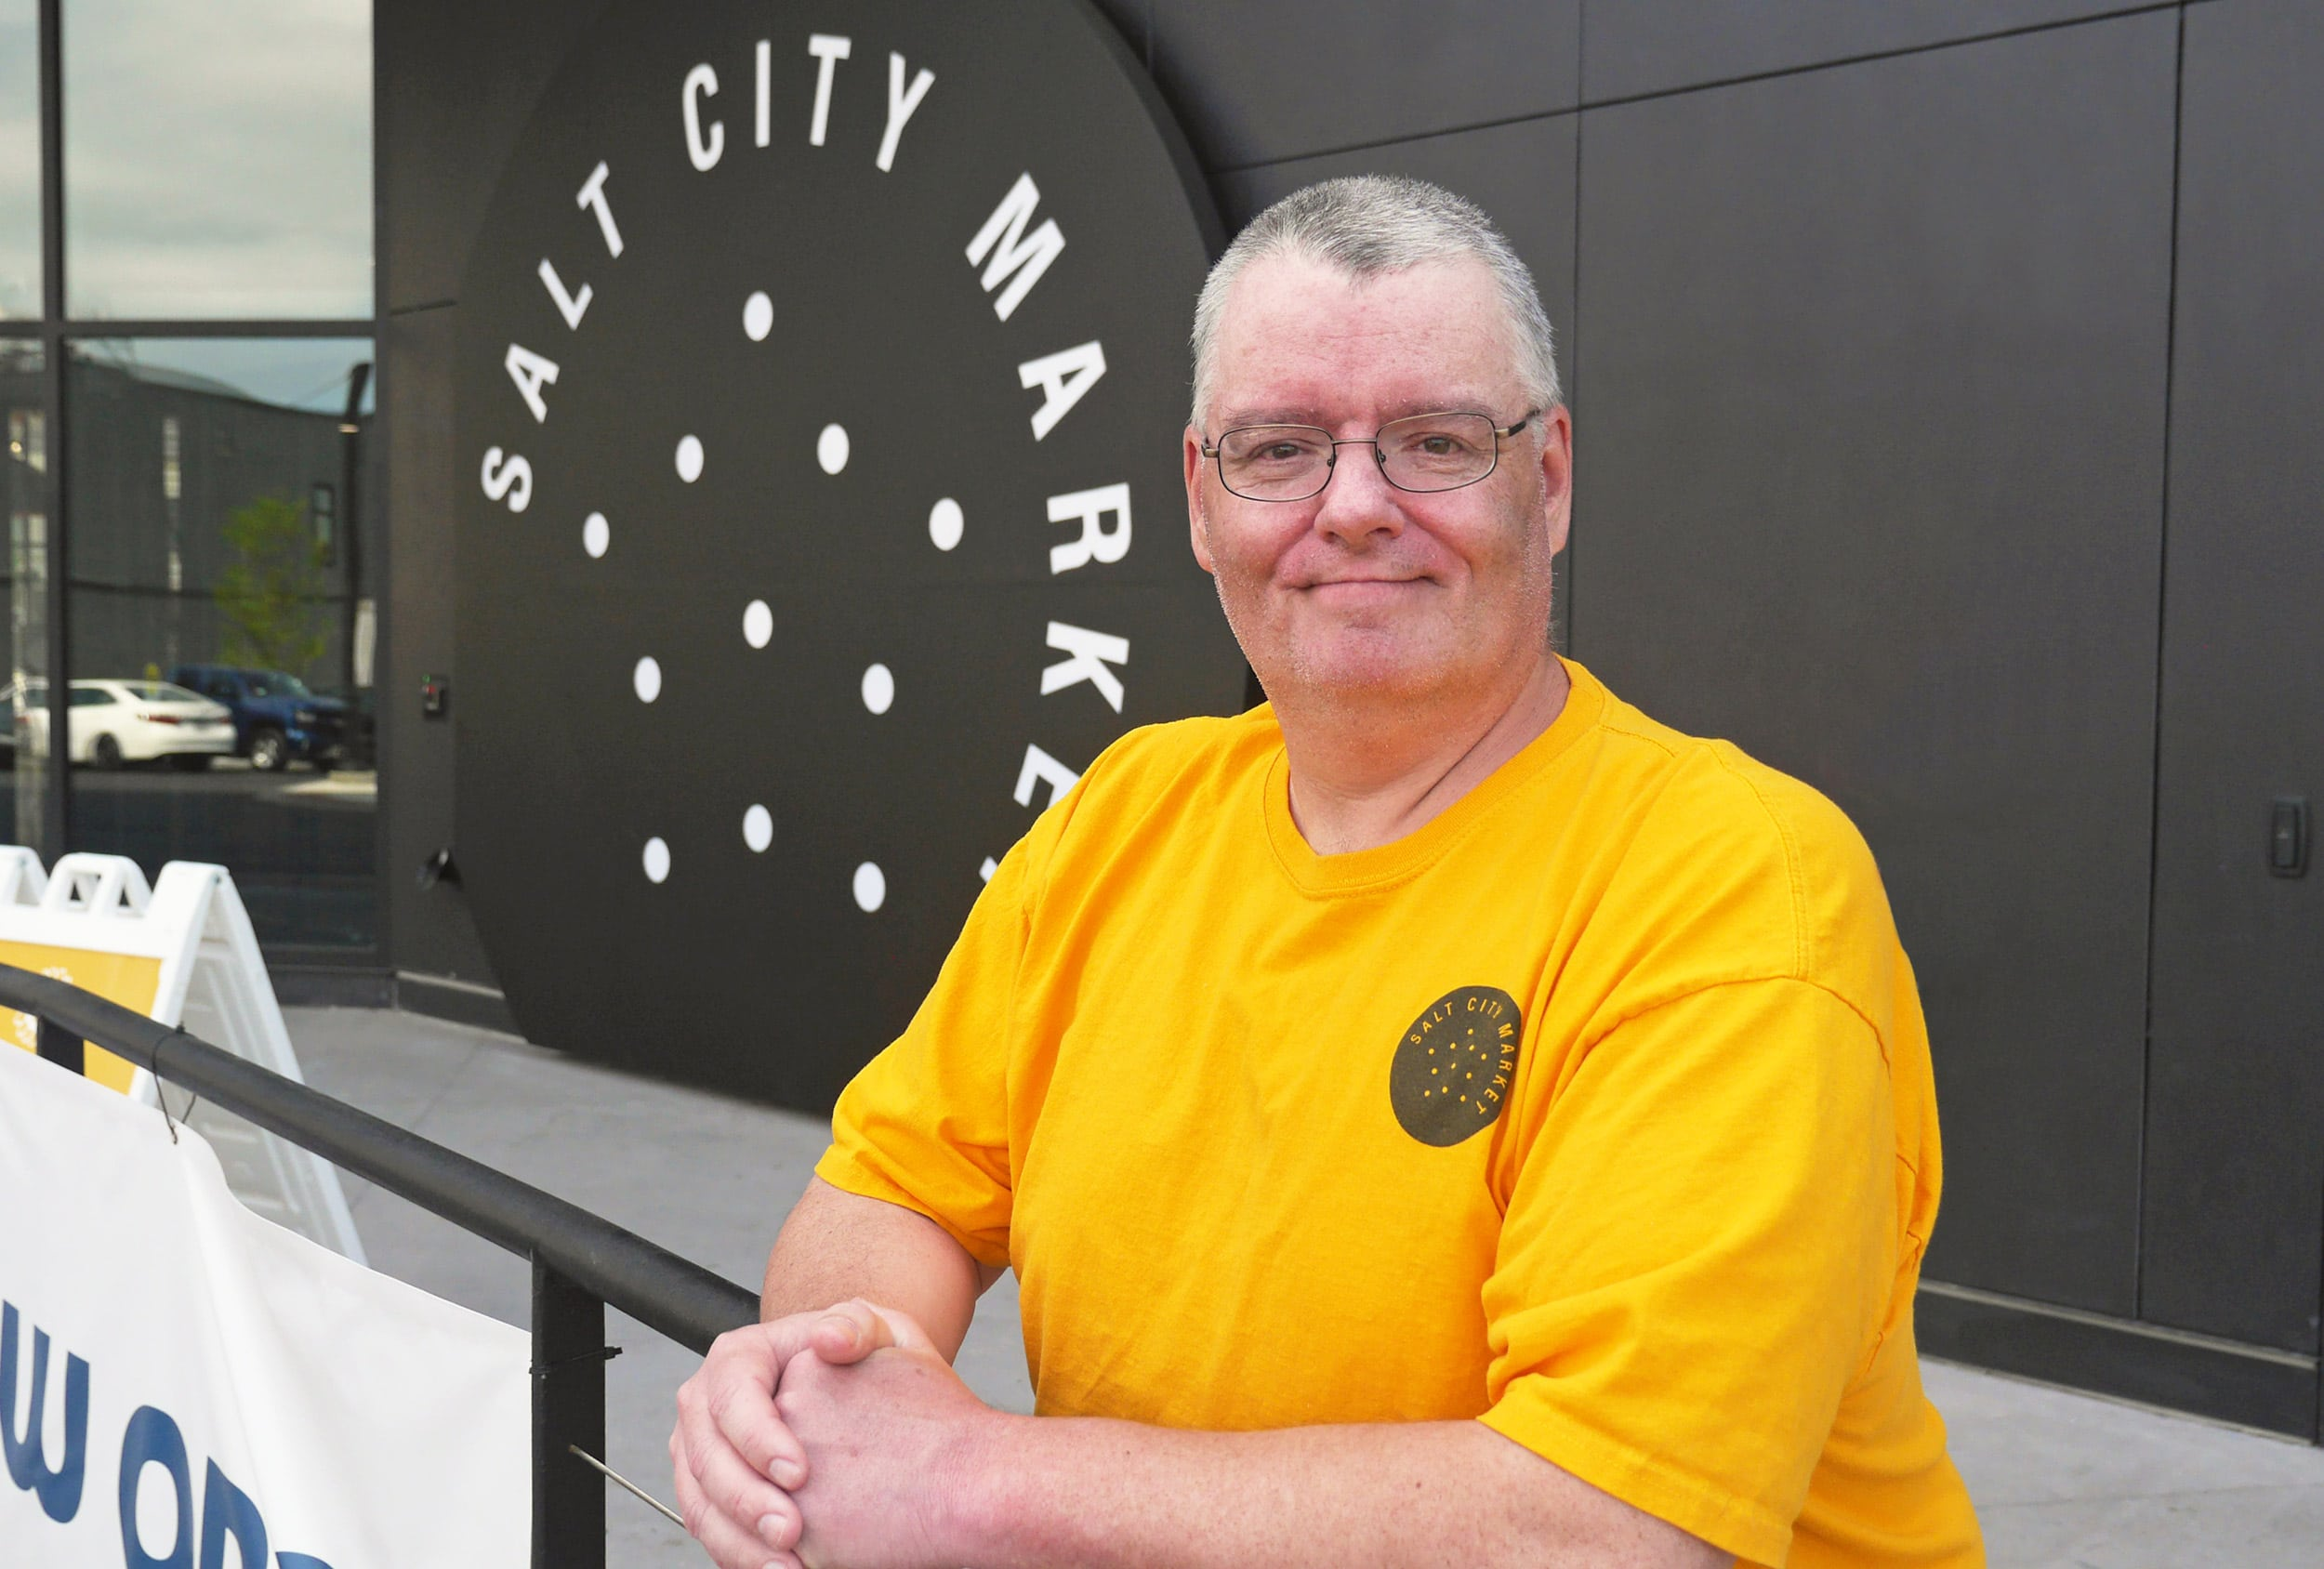 Salt City Market and Rescue Mission Announce New Ambassador Workforce Program